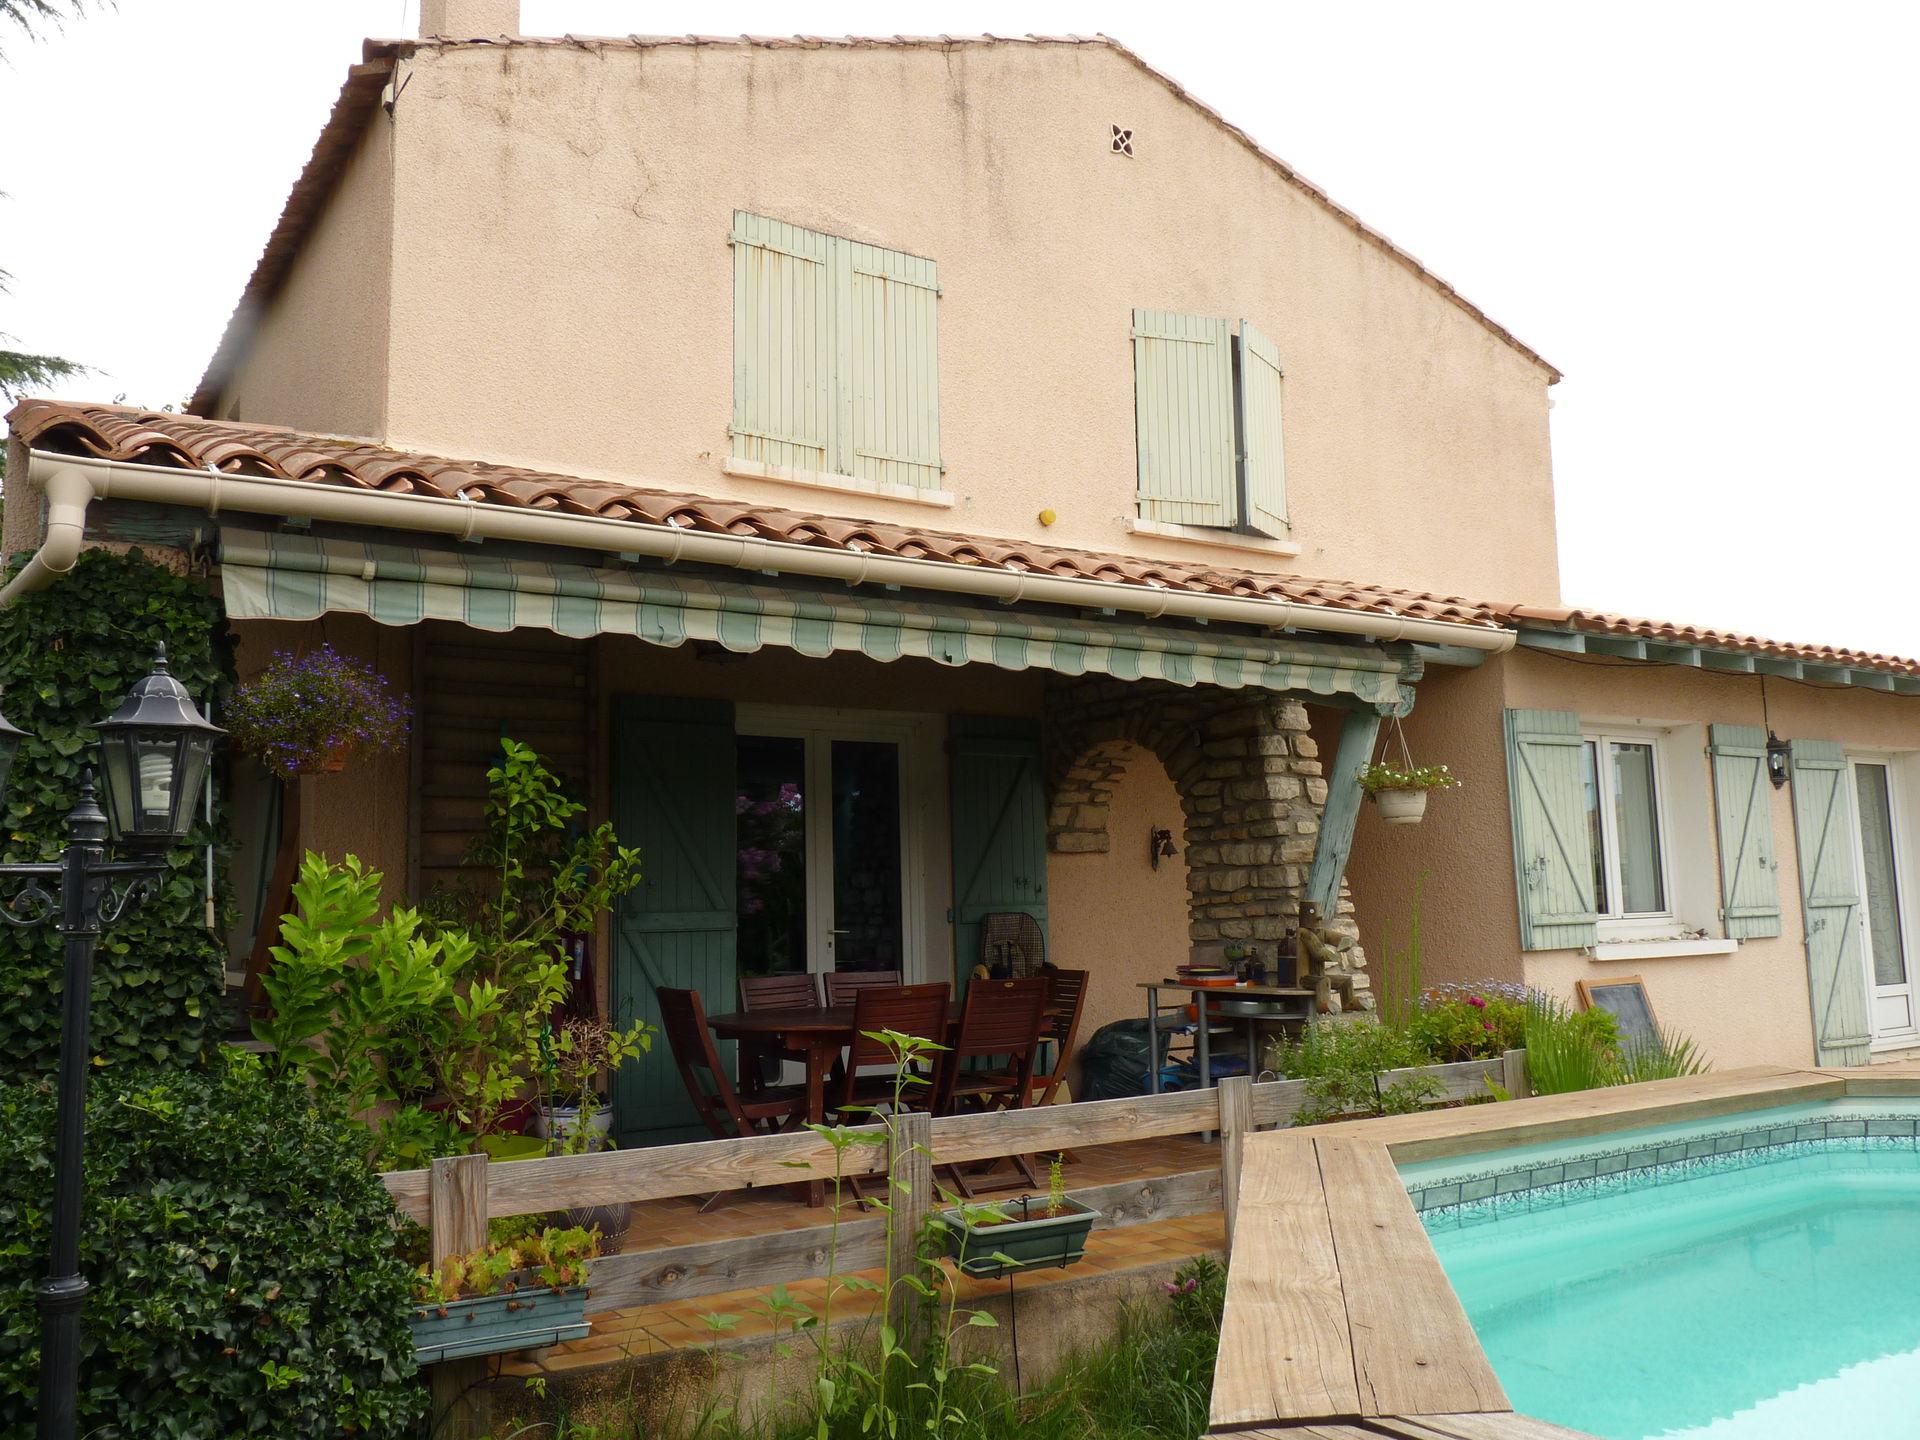 A 10 min de Nîmes, grande maison avec jardin et piscine. - Boligbytte